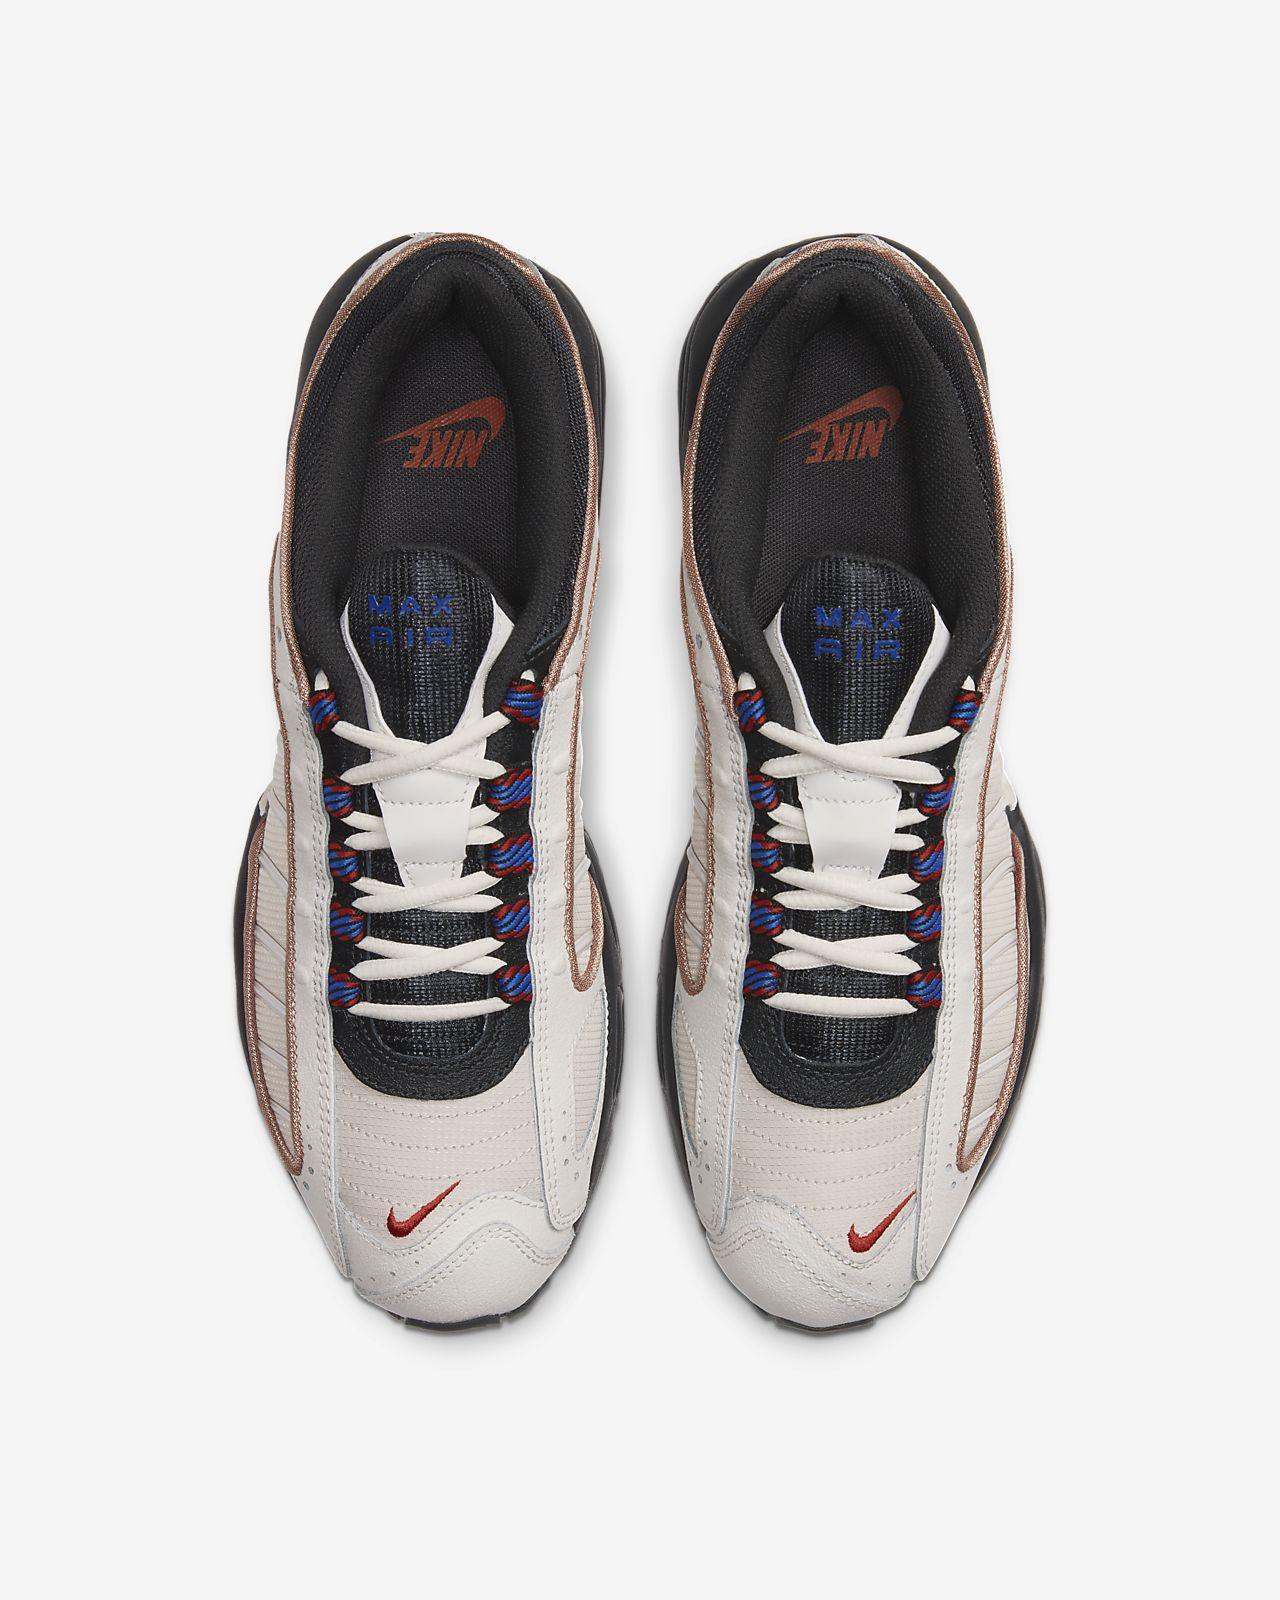 Nike Air Max Tailwind IV Se CJ9681 001